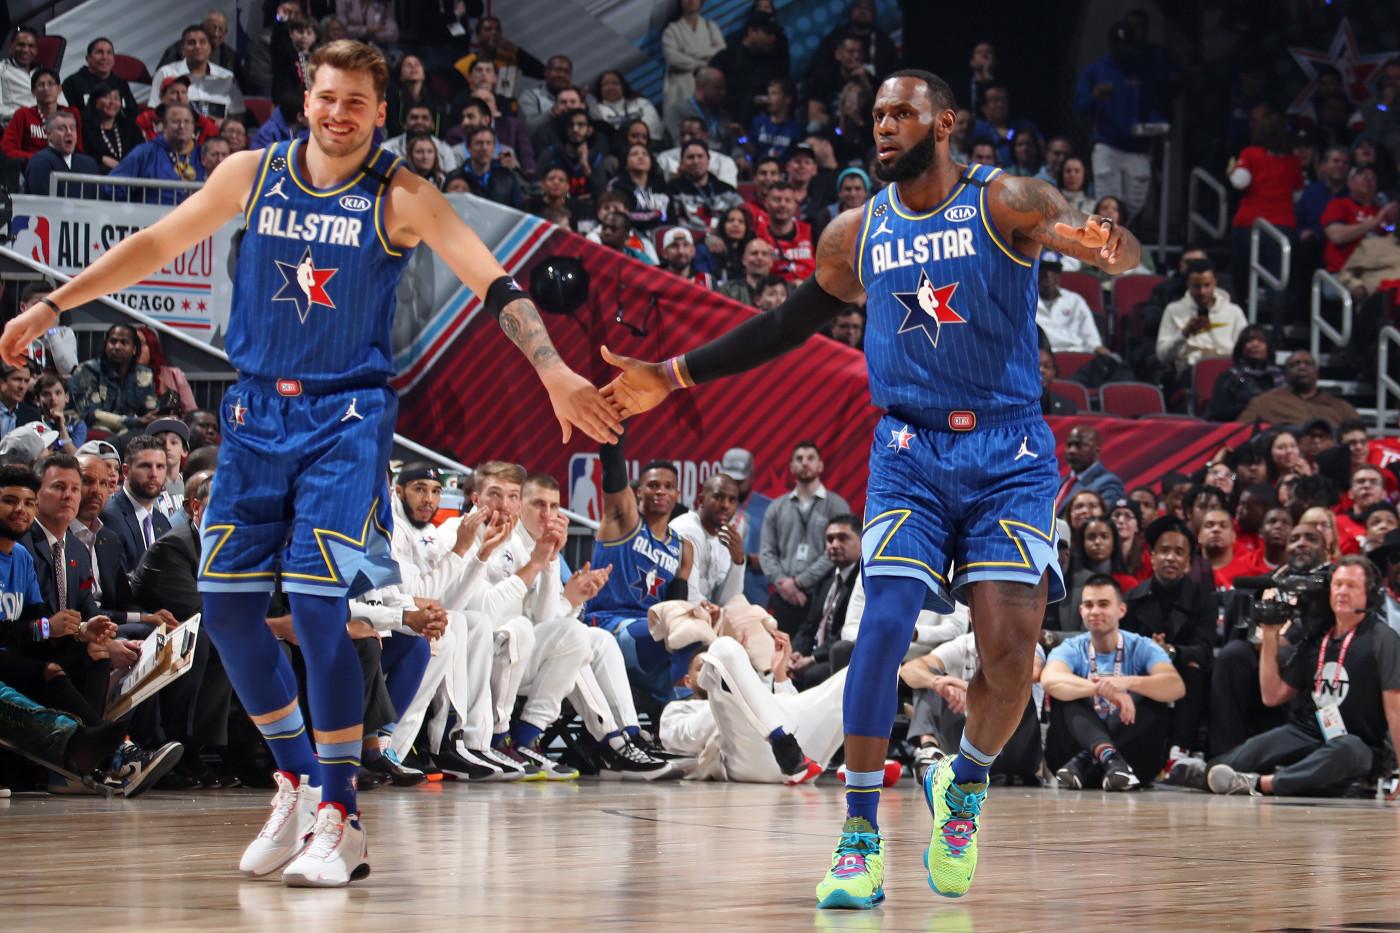 Luka Doncic & LeBron James